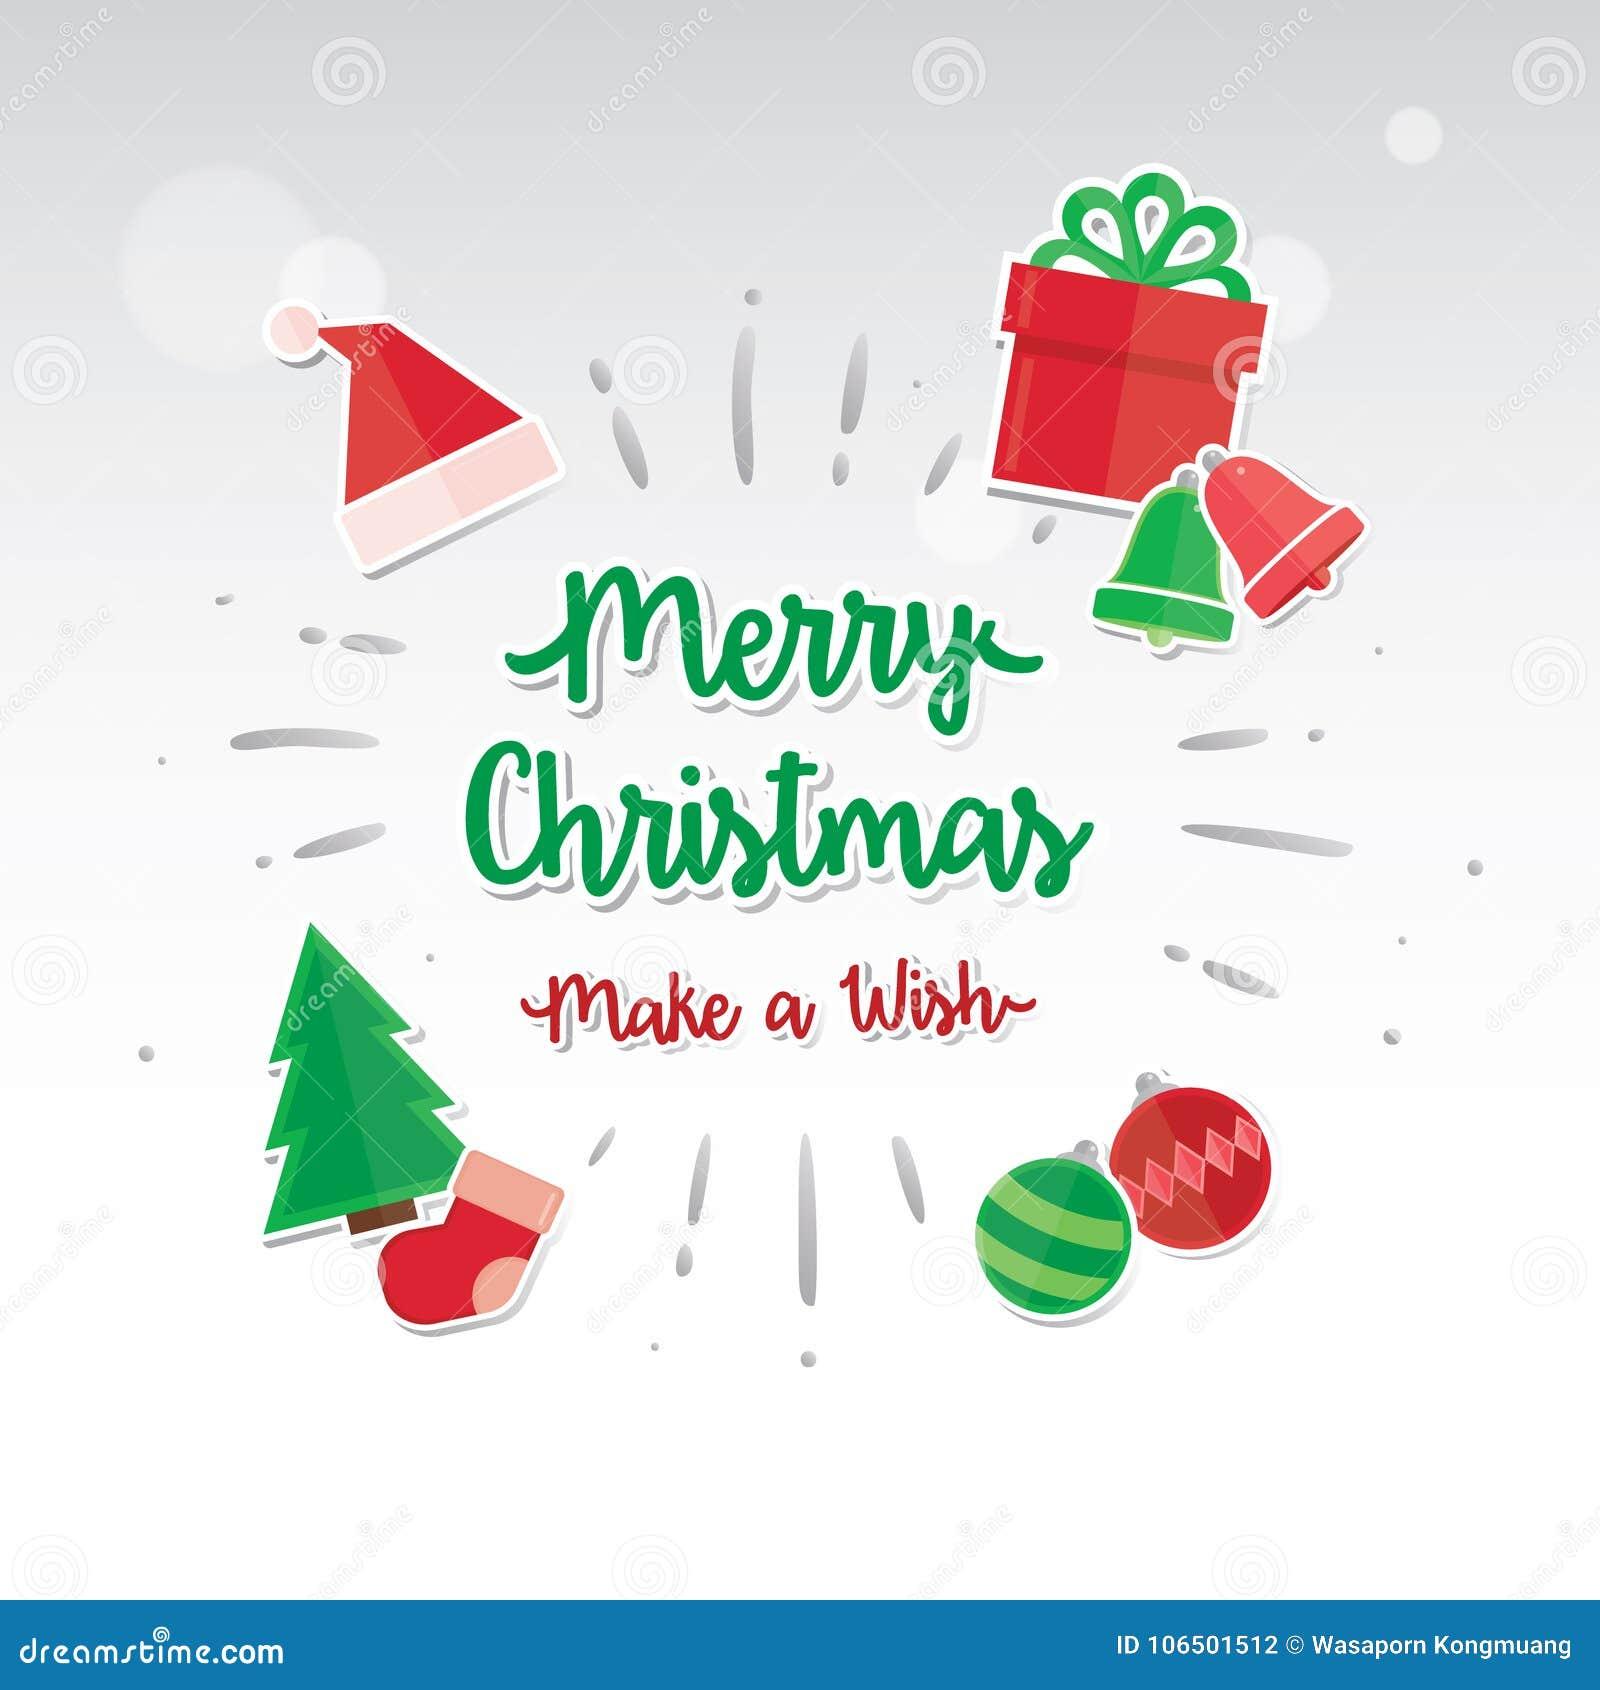 merry christmas card design greeting christmas card template on